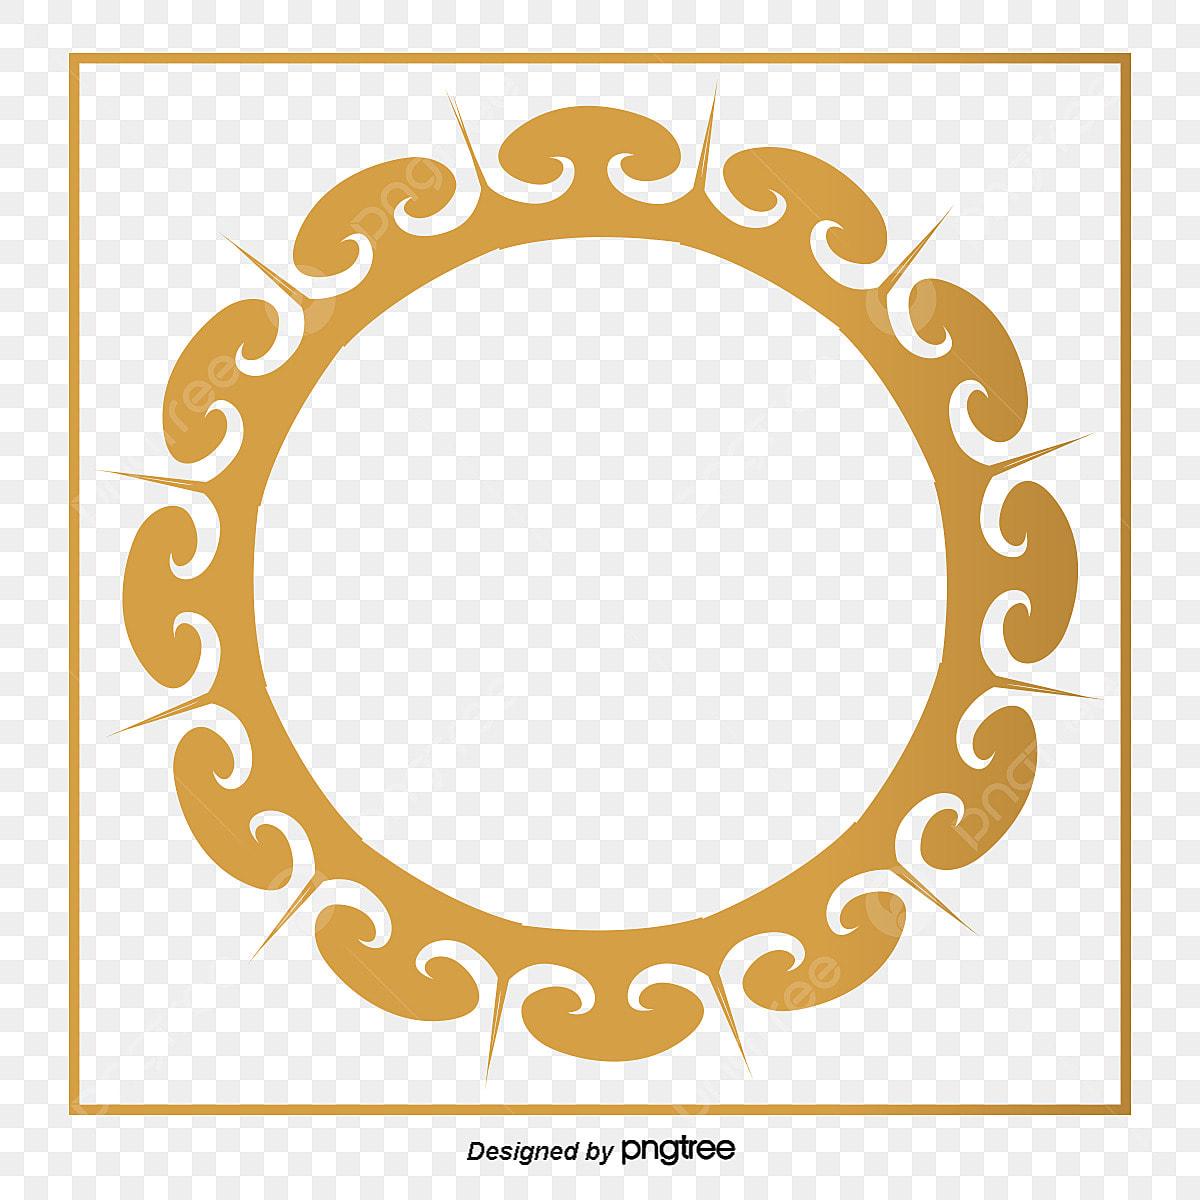 Png اطارات للتصميم مفرغه ذهبي